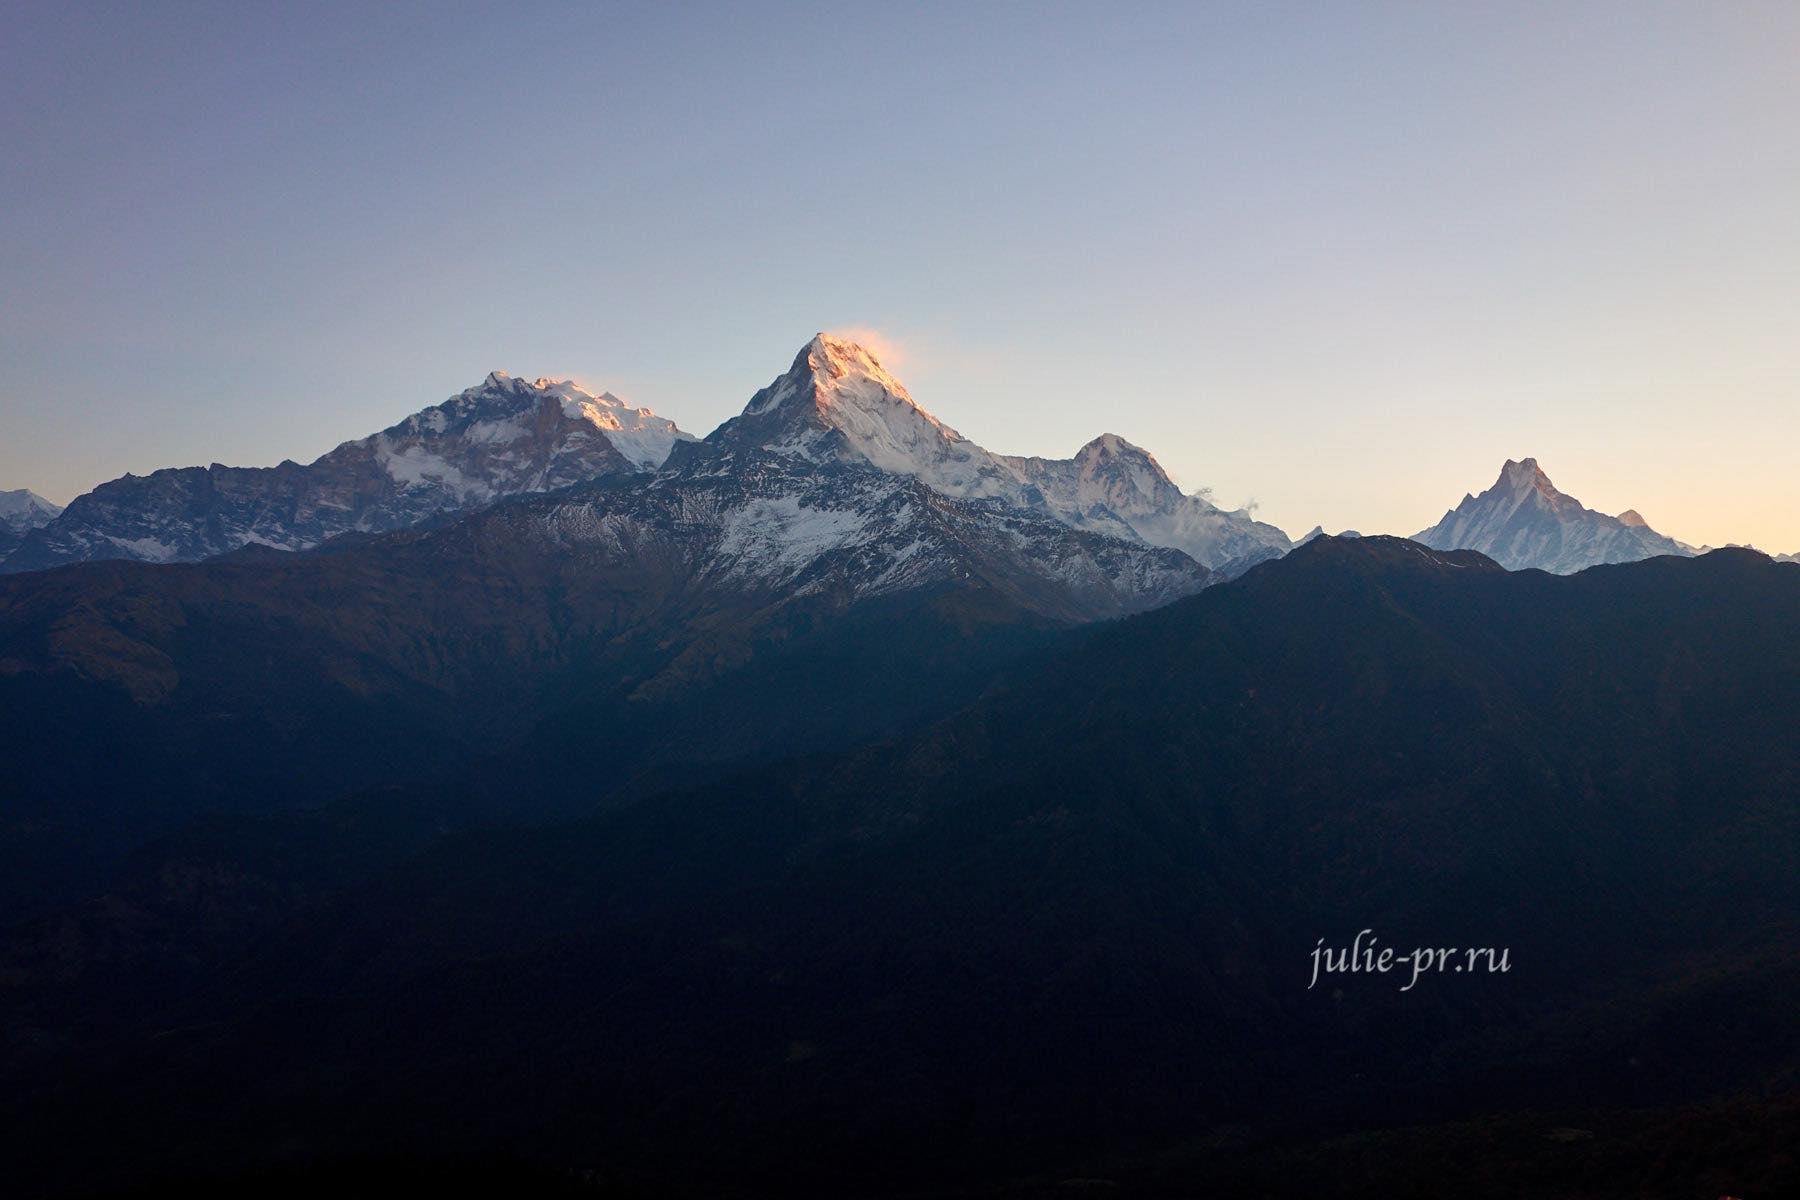 Непал, Пун-Хилл трек, Восход, Аннапурна